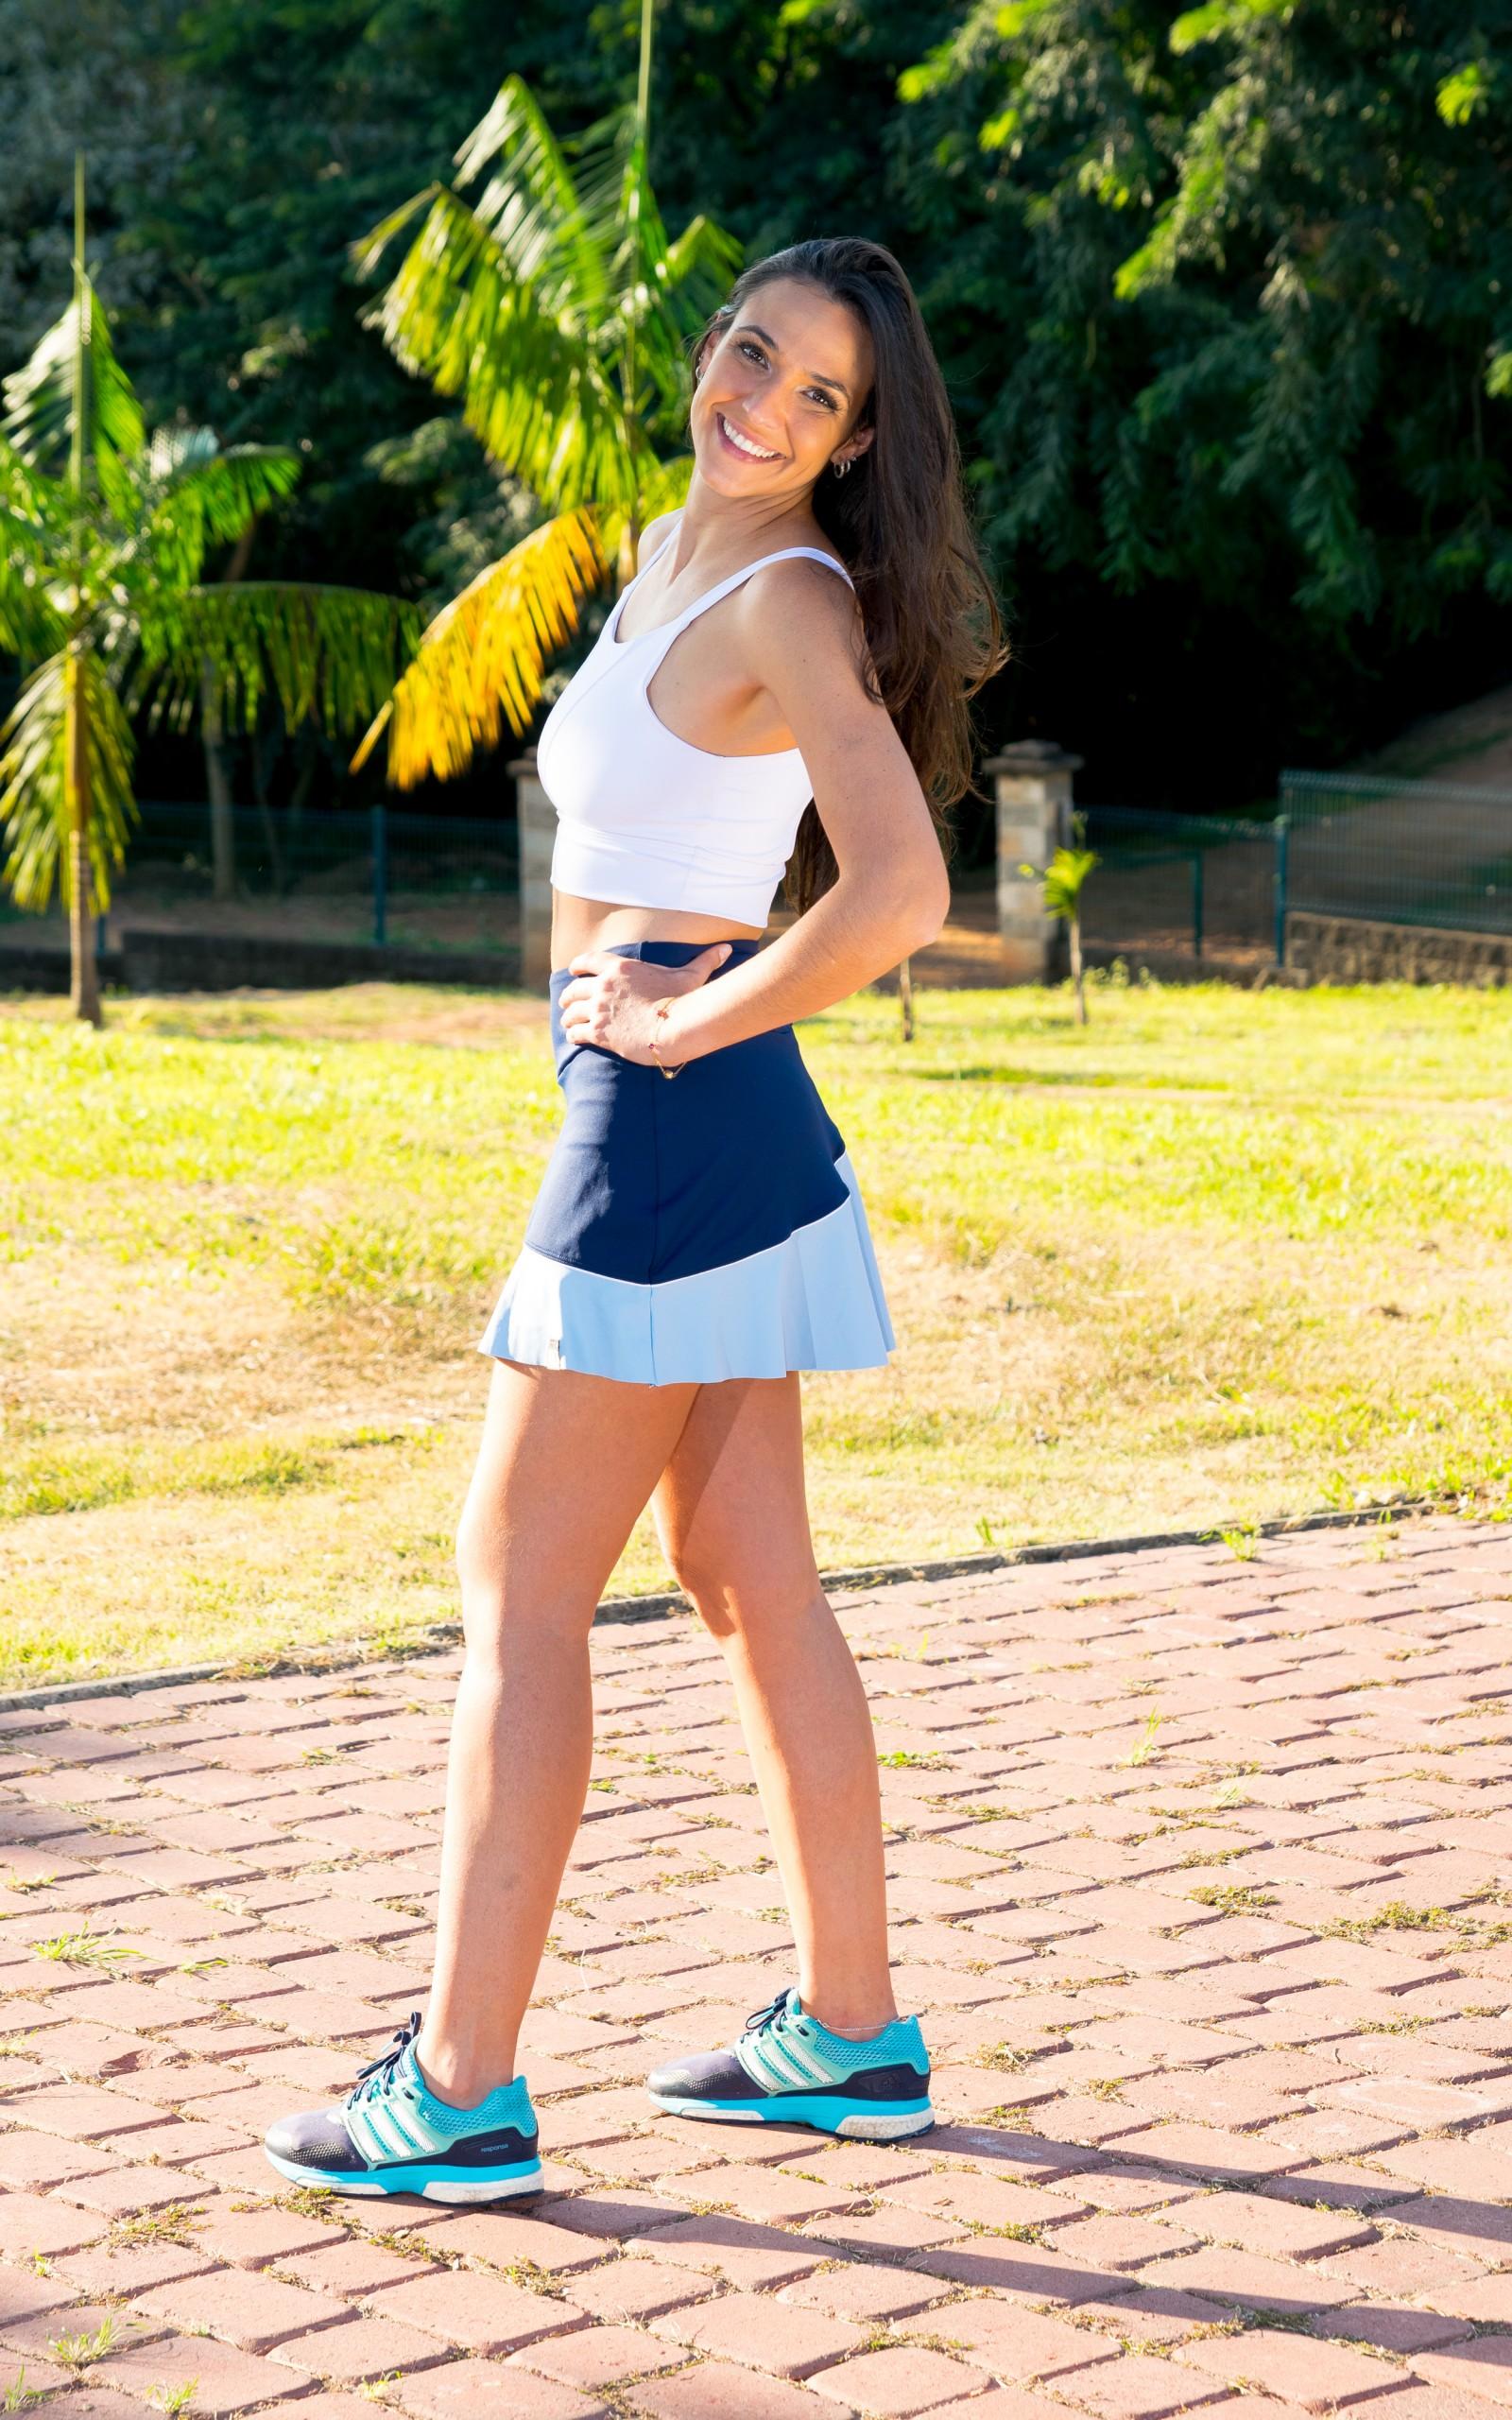 Croopped Alluring Branco, Coleção YOURSELF - NKT Fitwear Moda Fitness